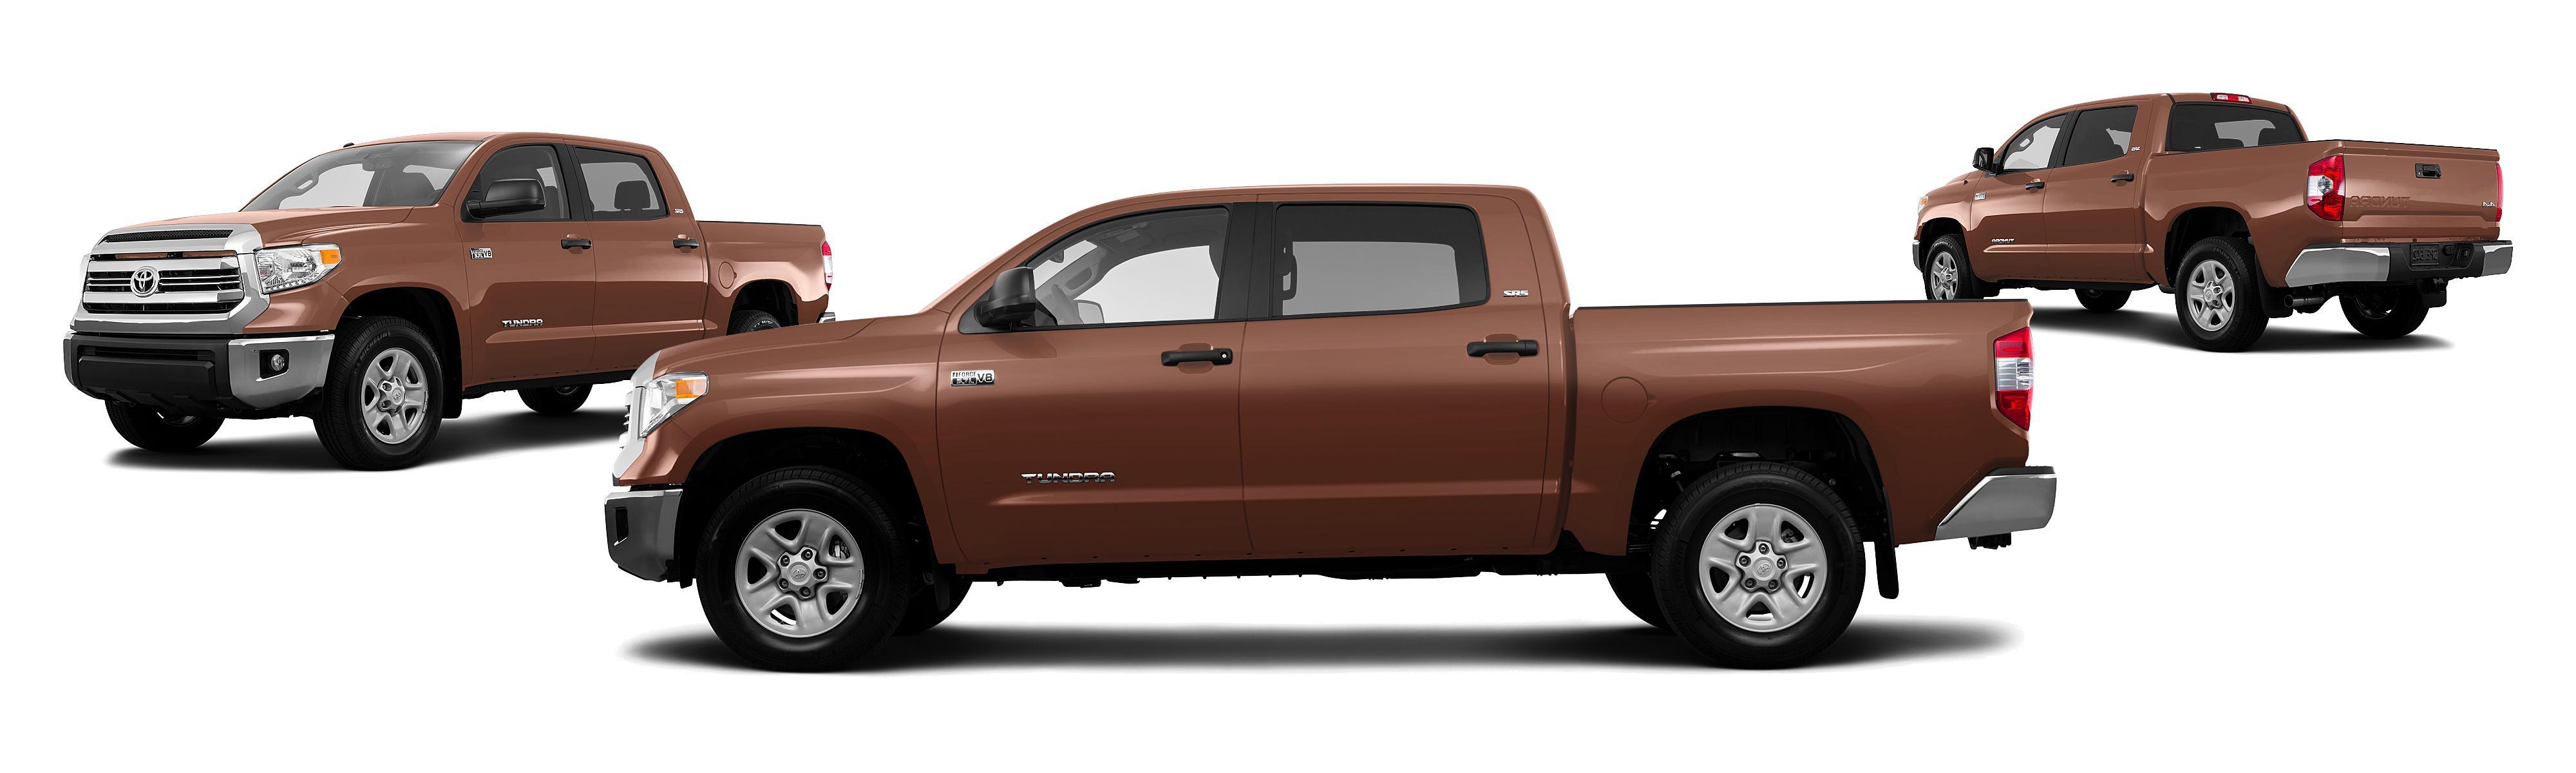 Toyota Tundra Invoice Price